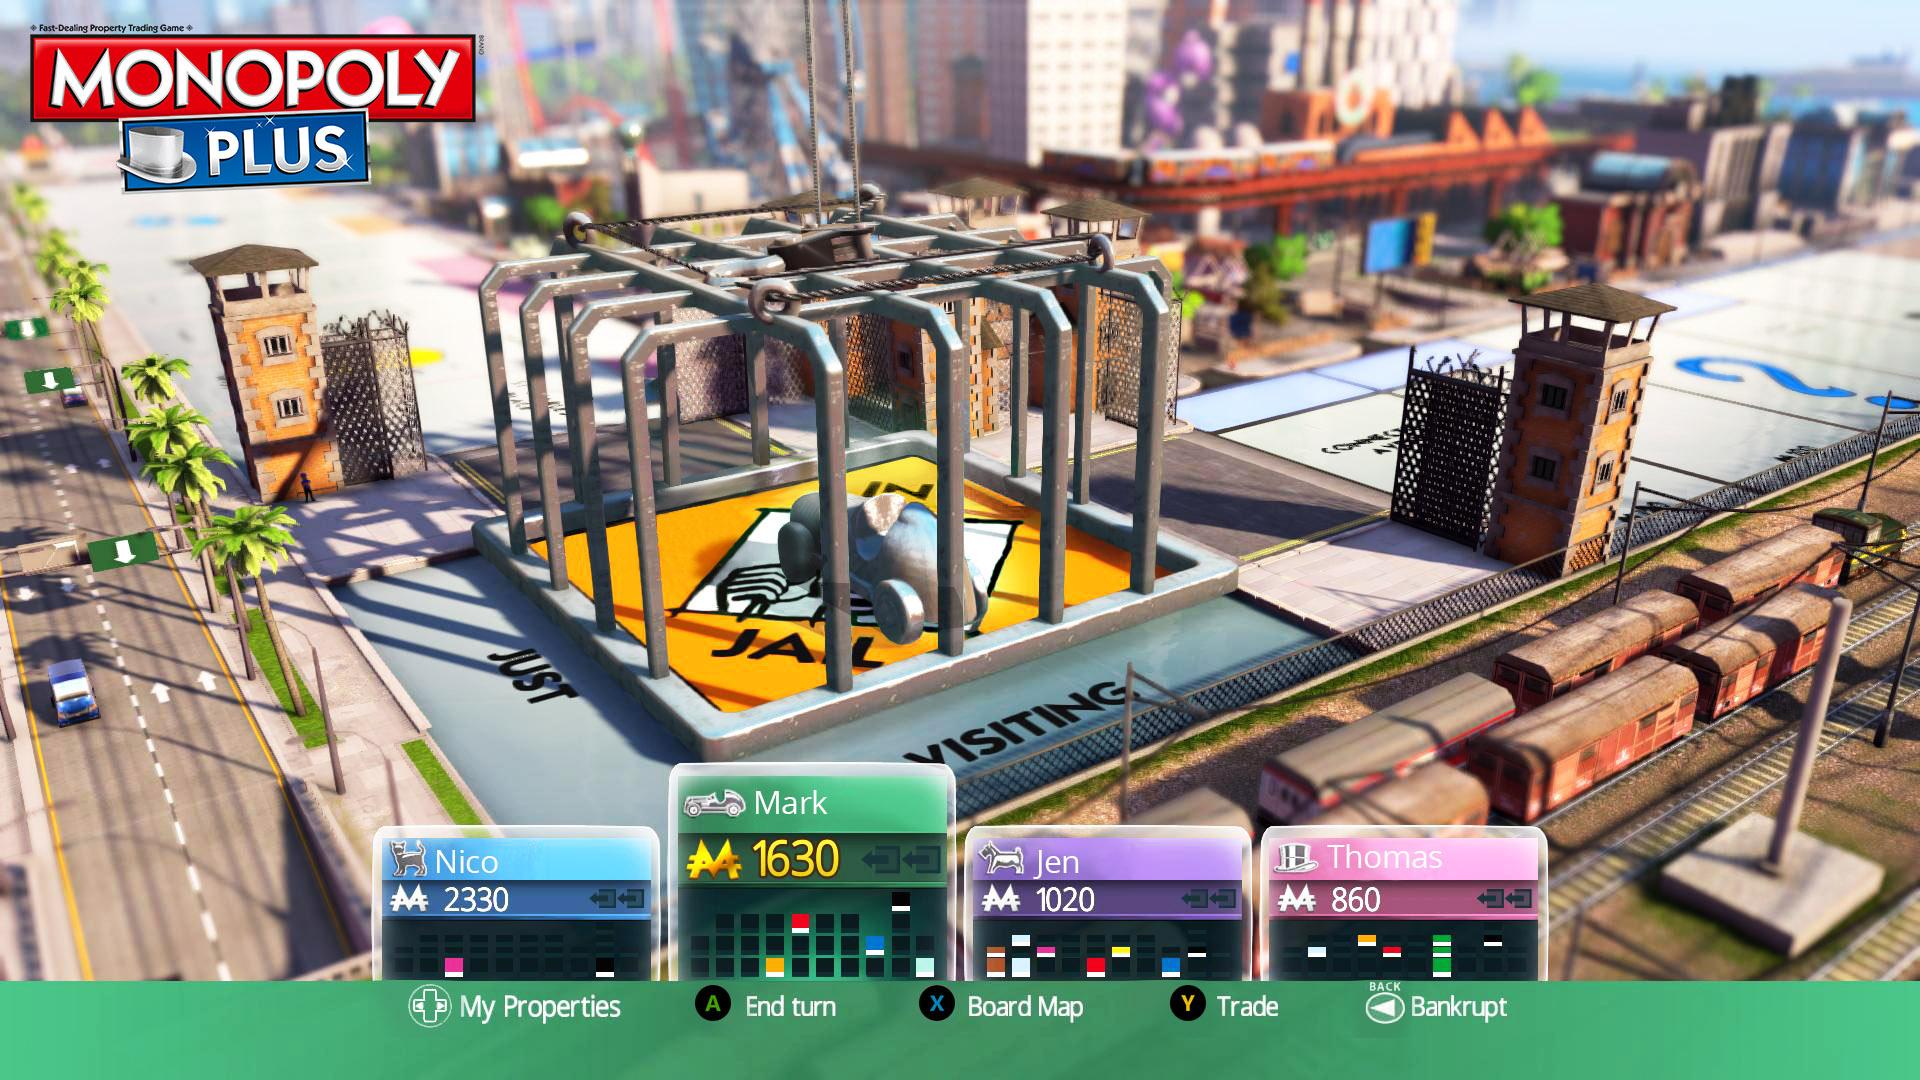 HBG Monopoly Plus Screens 2